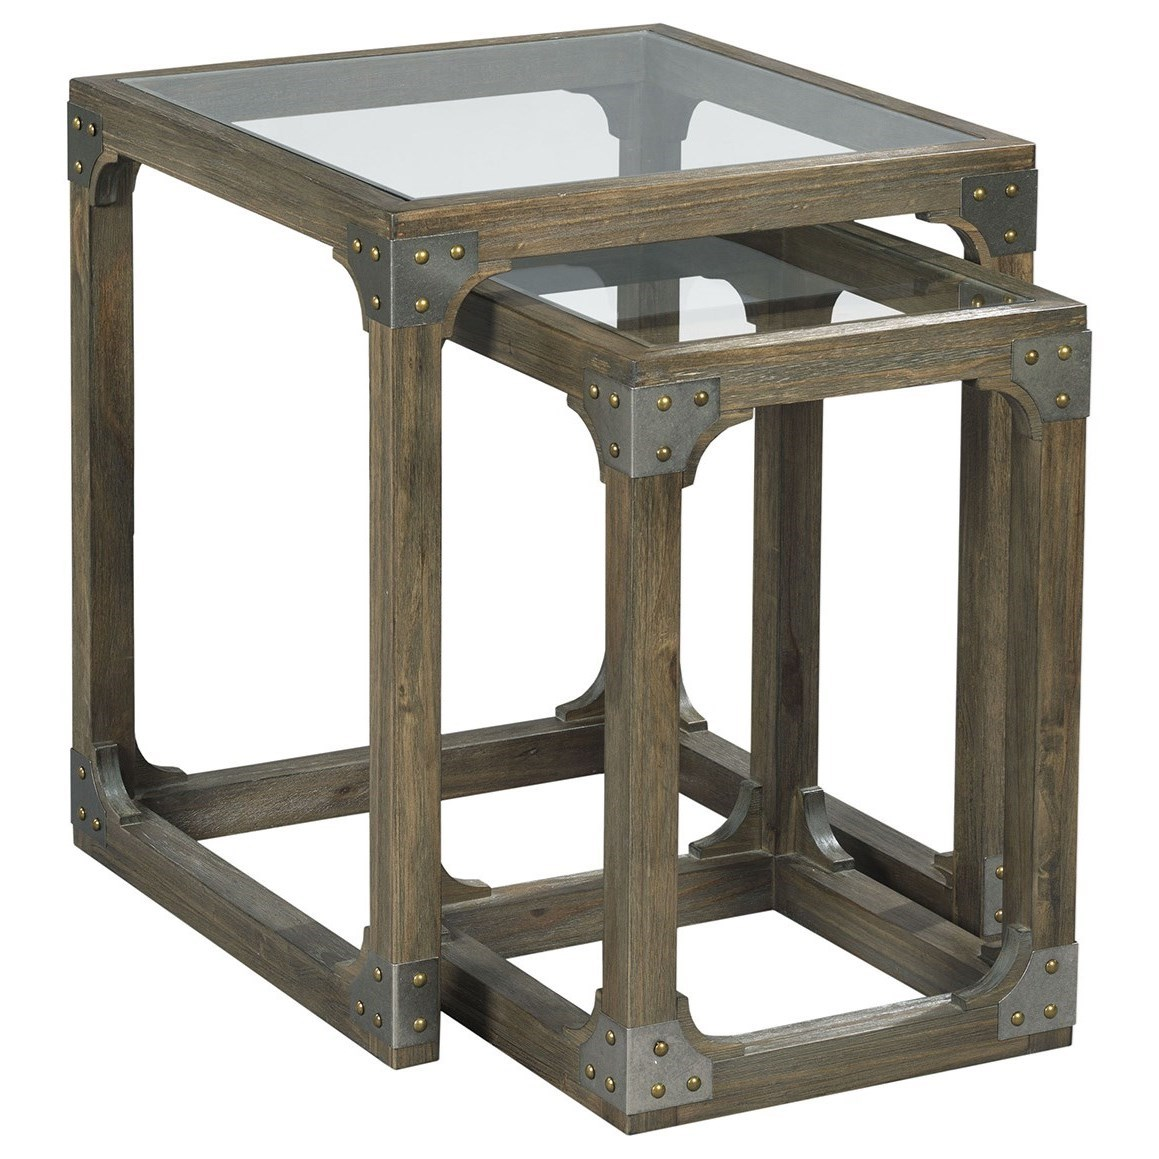 Hammary Hidden Treasures Rustic Nesting Tables Wayside